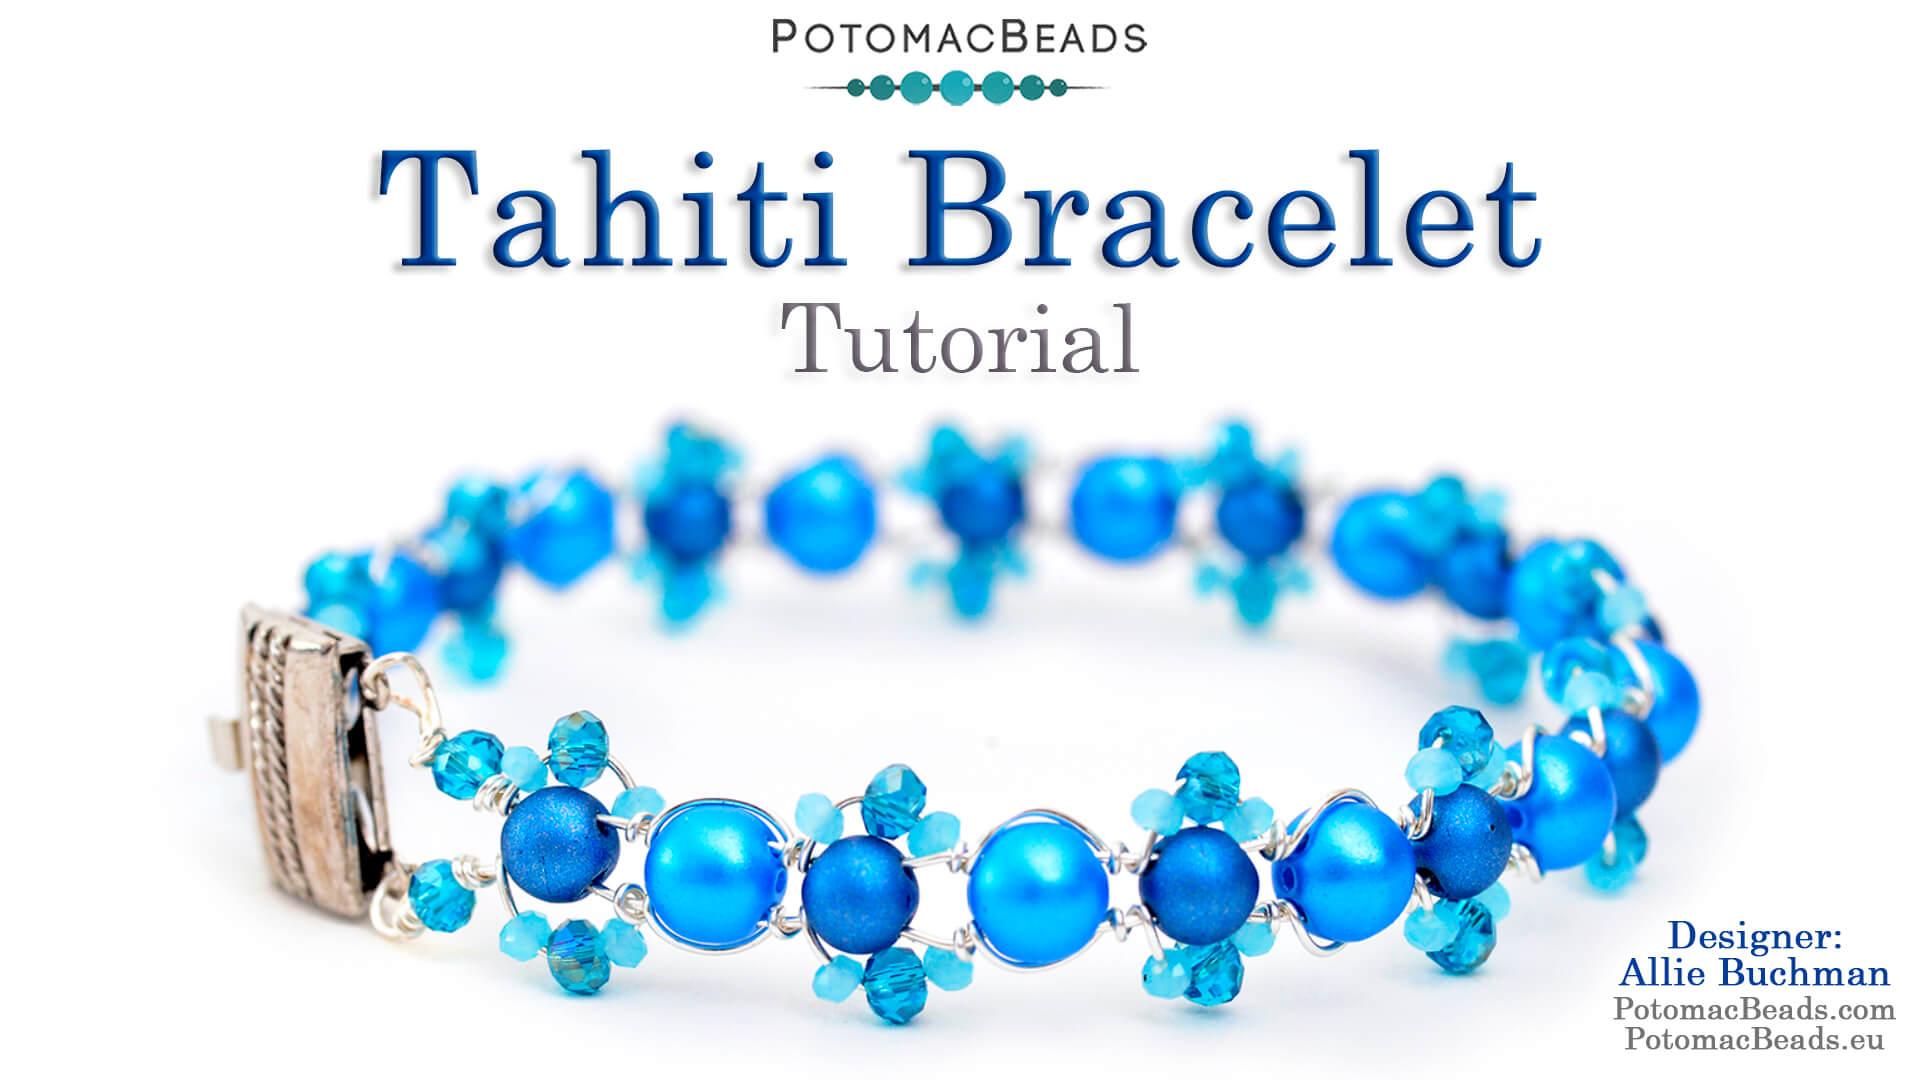 How to Bead / Videos Sorted by Beads / RounTrio® & RounTrio® Faceted Bead Videos / Tahiti Bracelet Tutorial